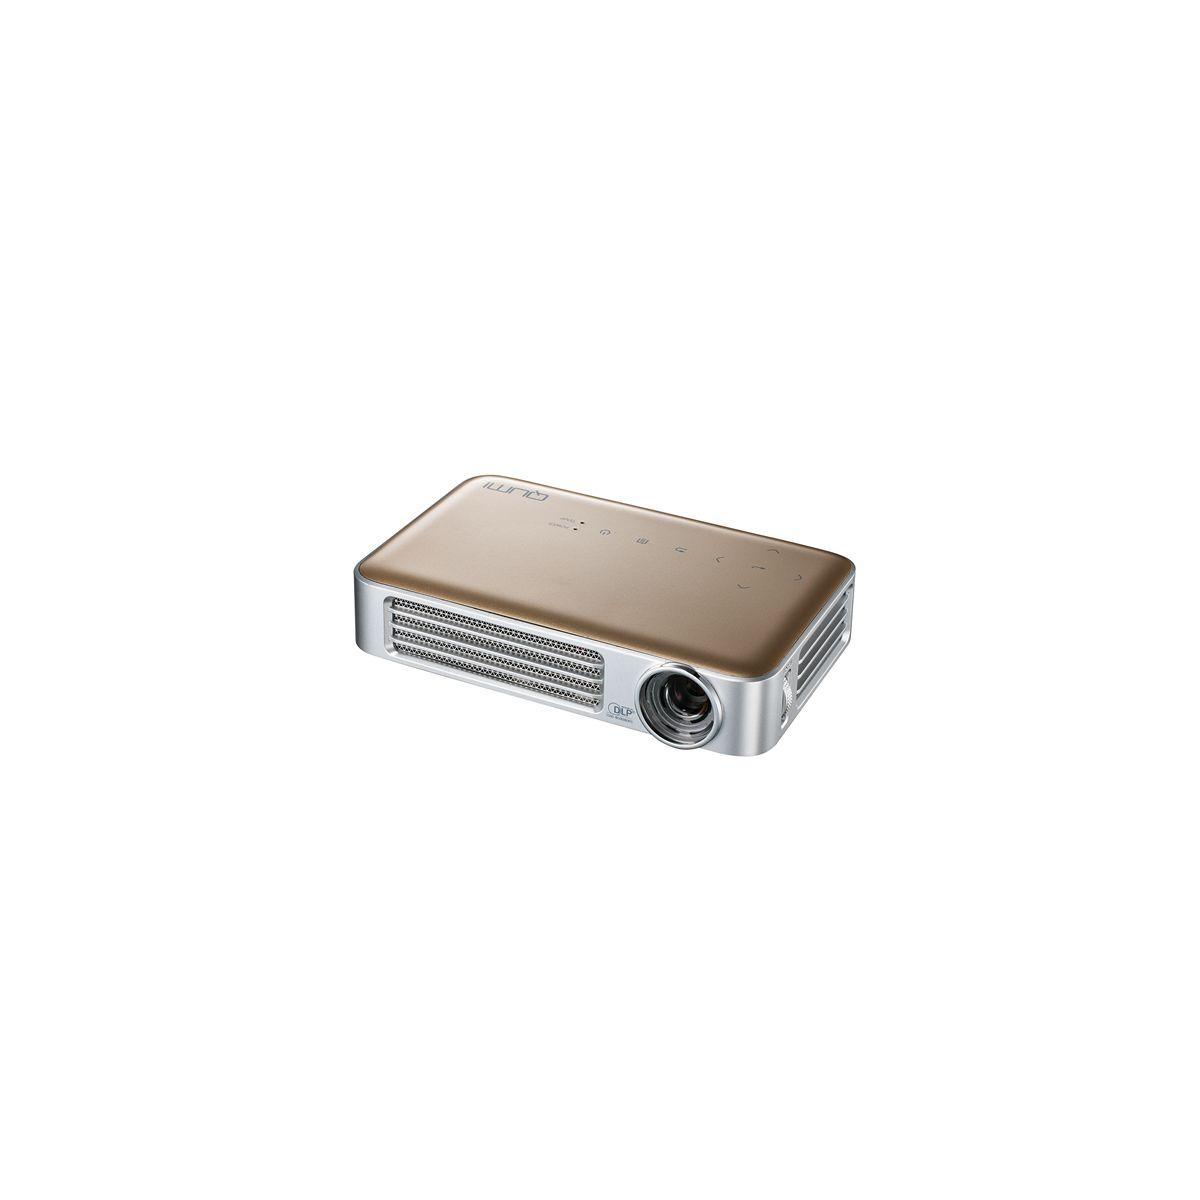 Projecteur vivitek qumi q6 or (photo)